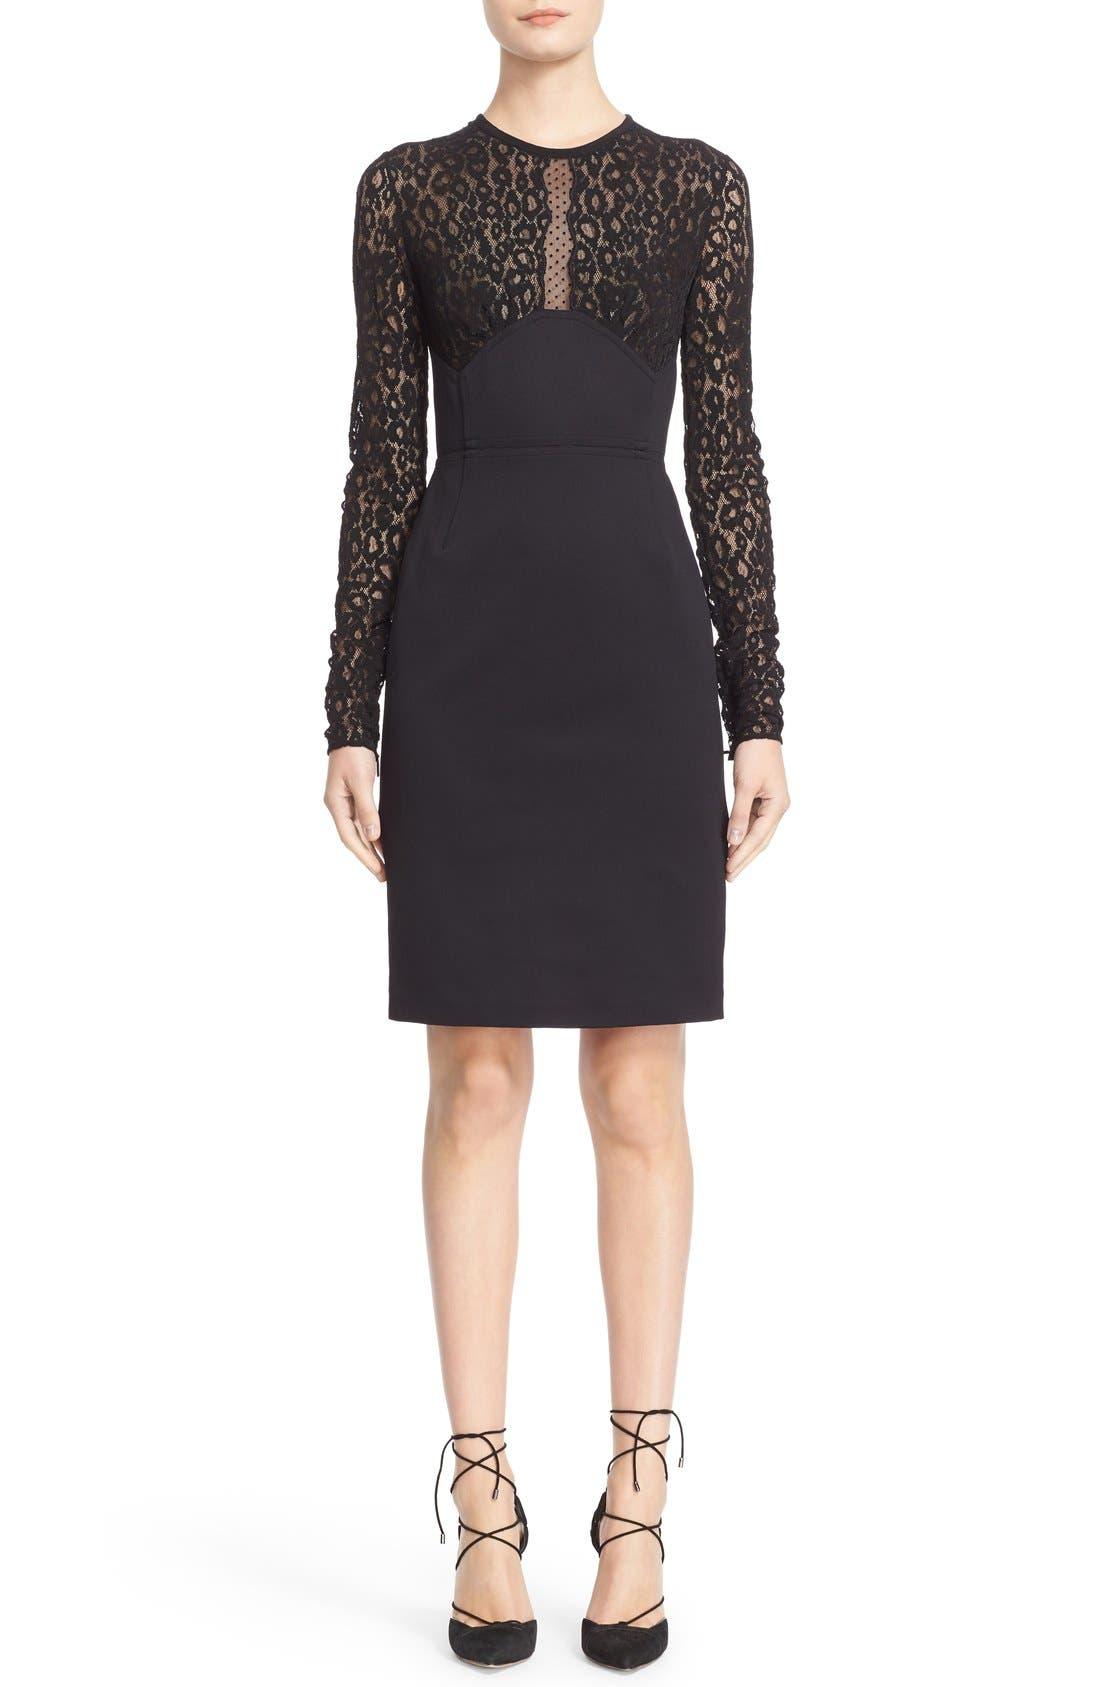 Alternate Image 1 Selected - Roberto Cavalli Lace & Jersey Sheath Dress